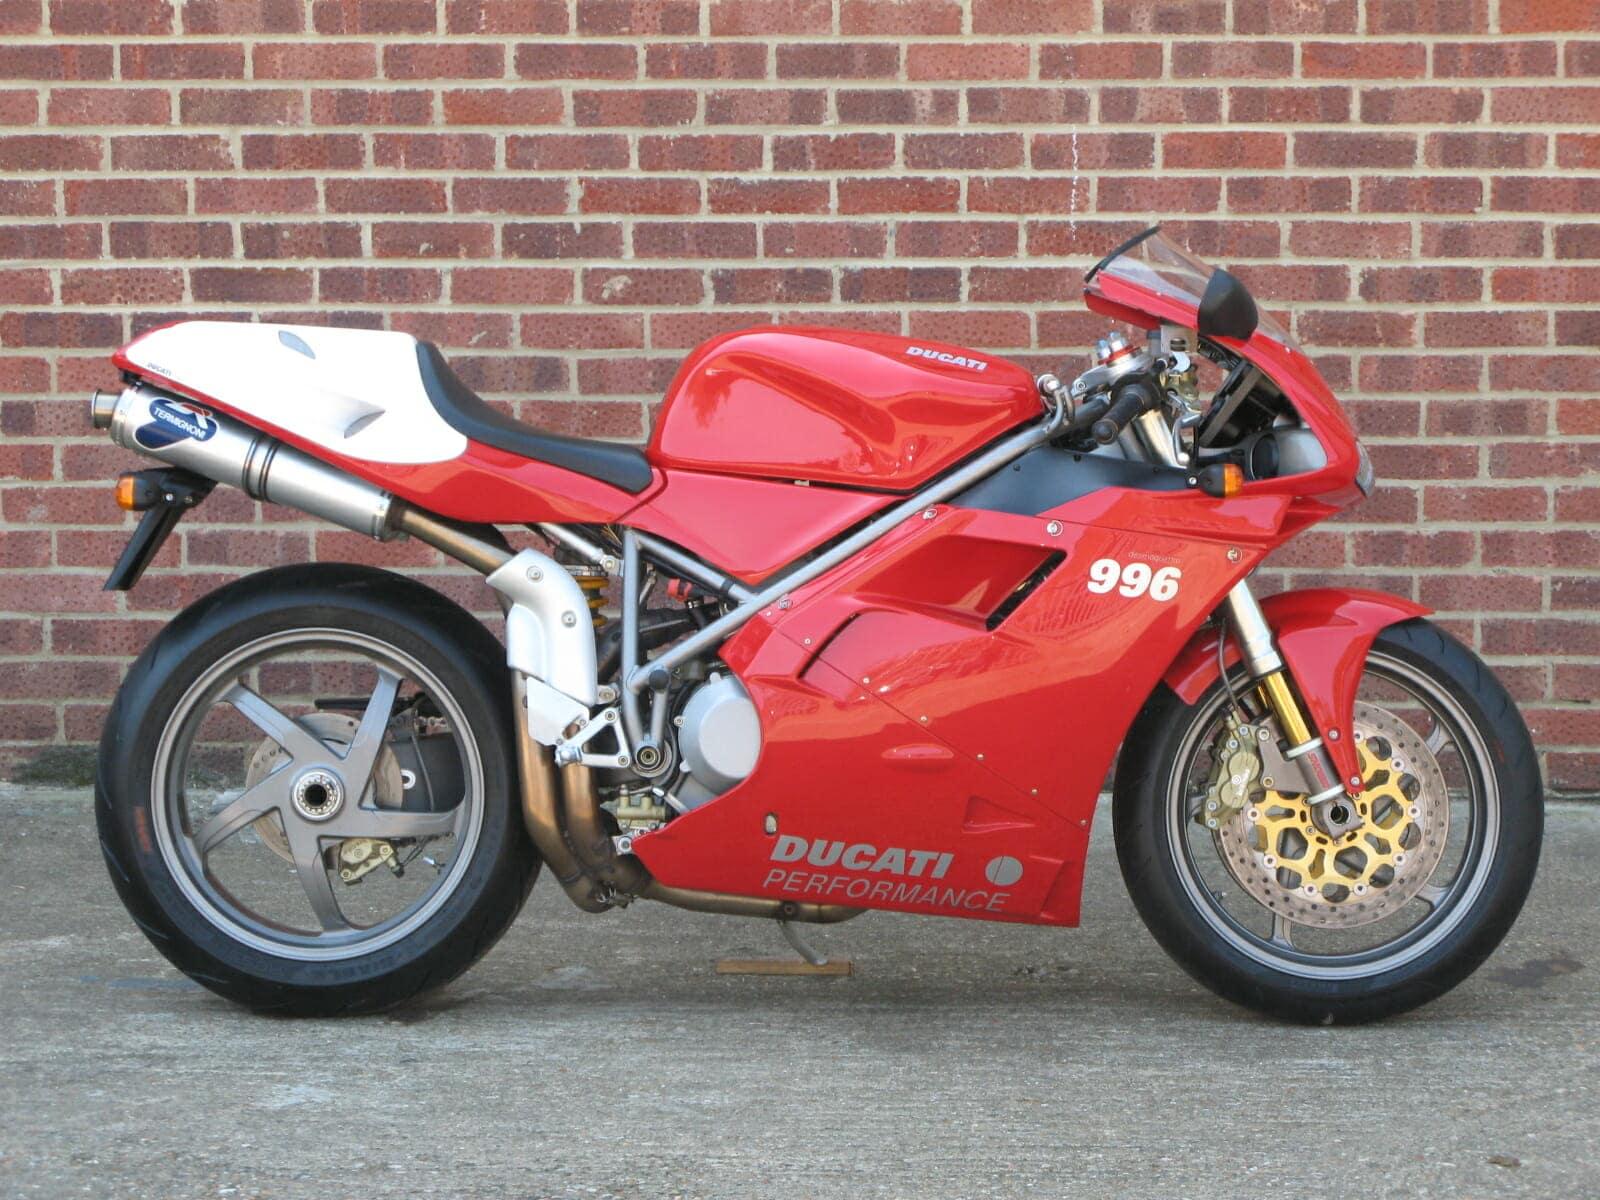 Ducati 996S - lighter Marchesini wheels